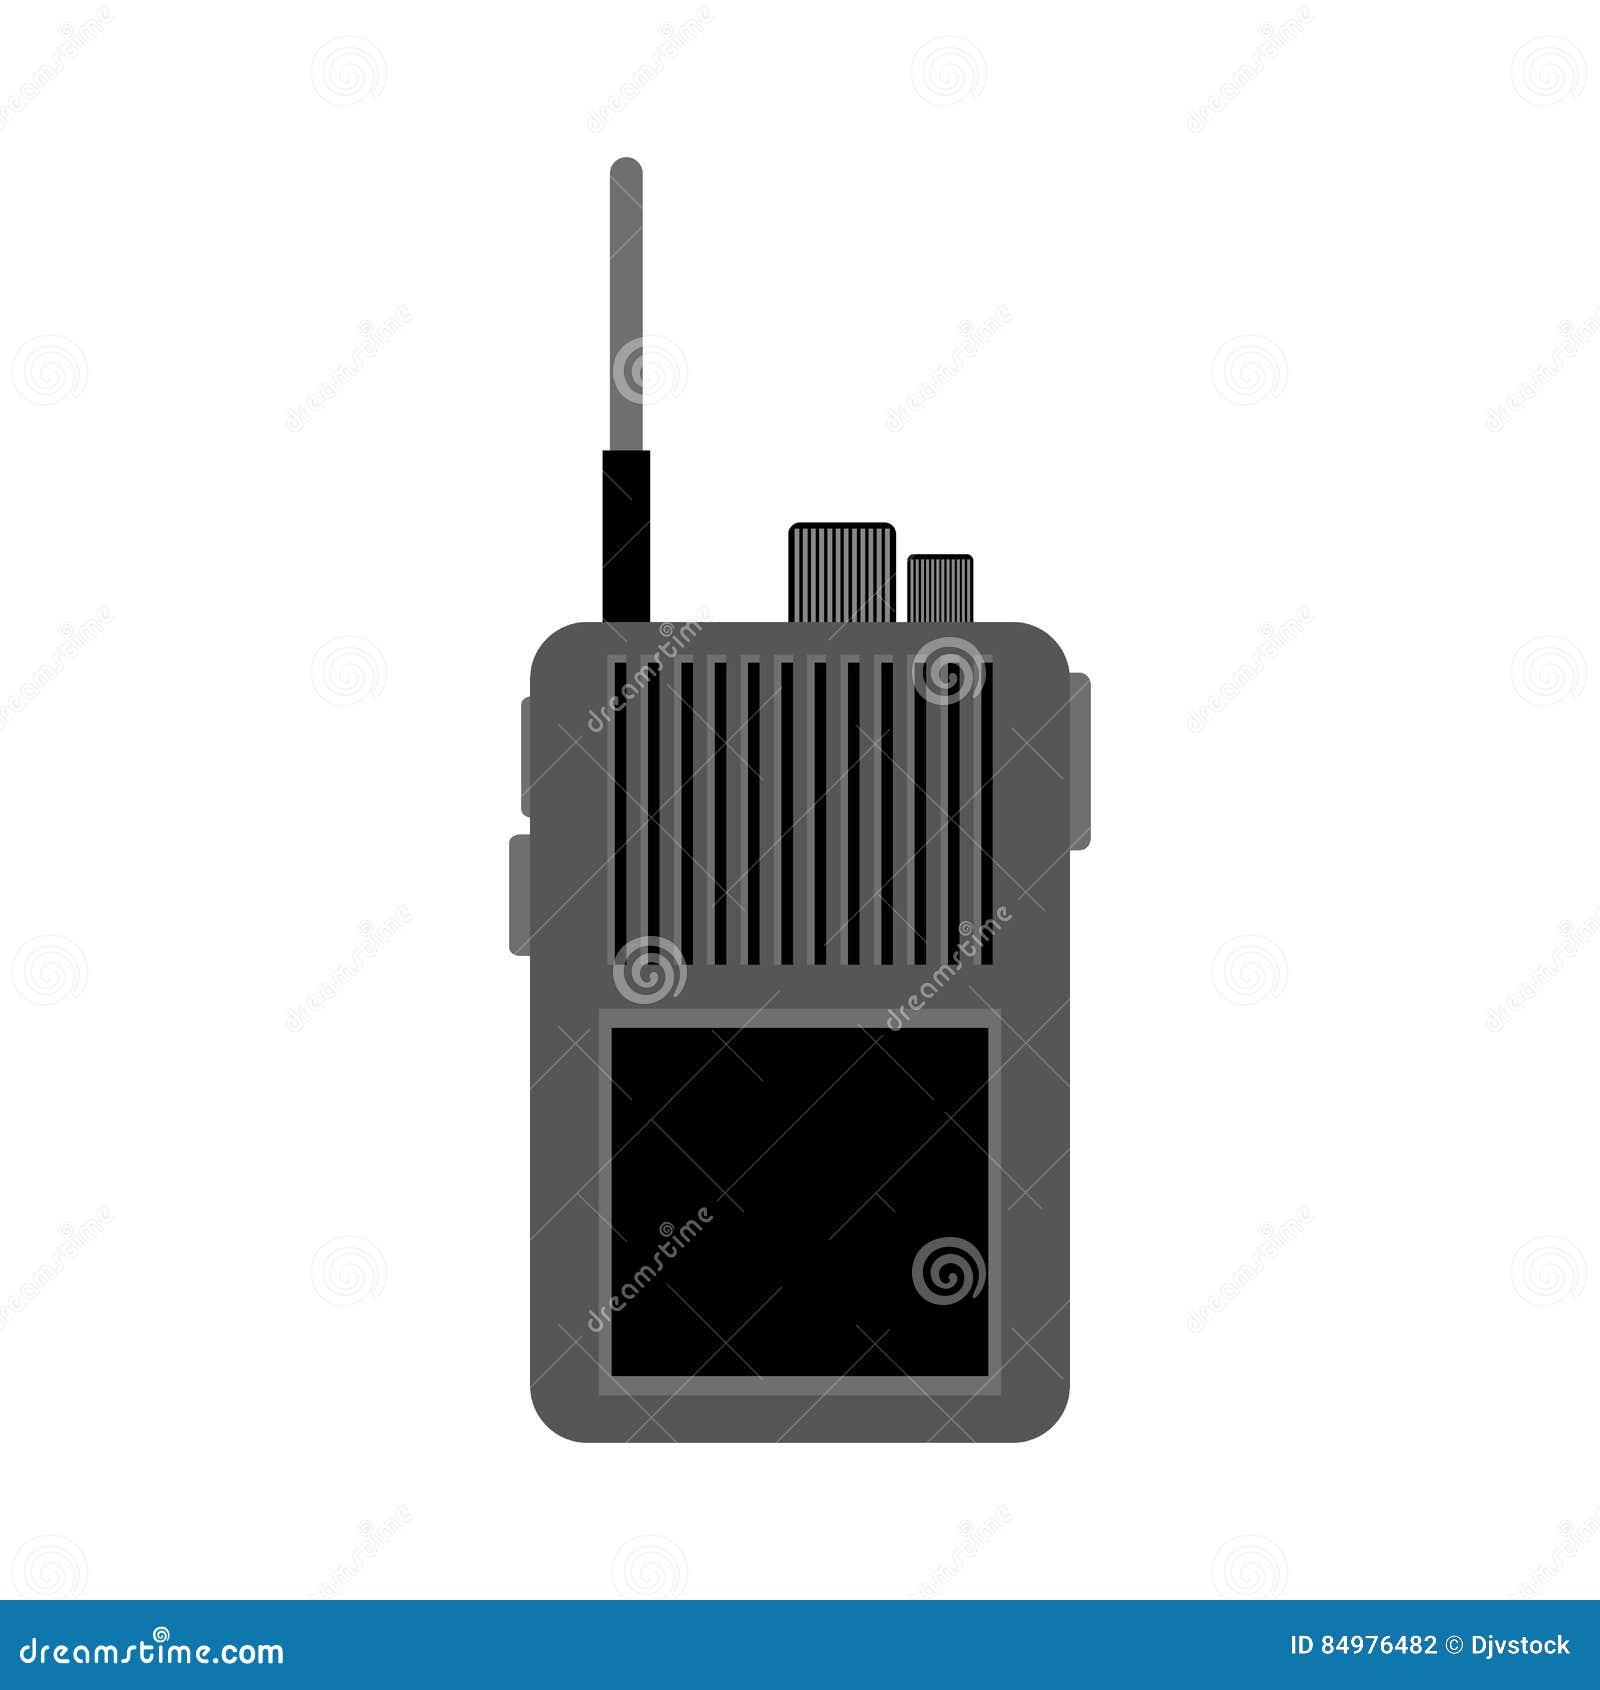 Walkie Talkie Contour Military Communication Equipment Stock